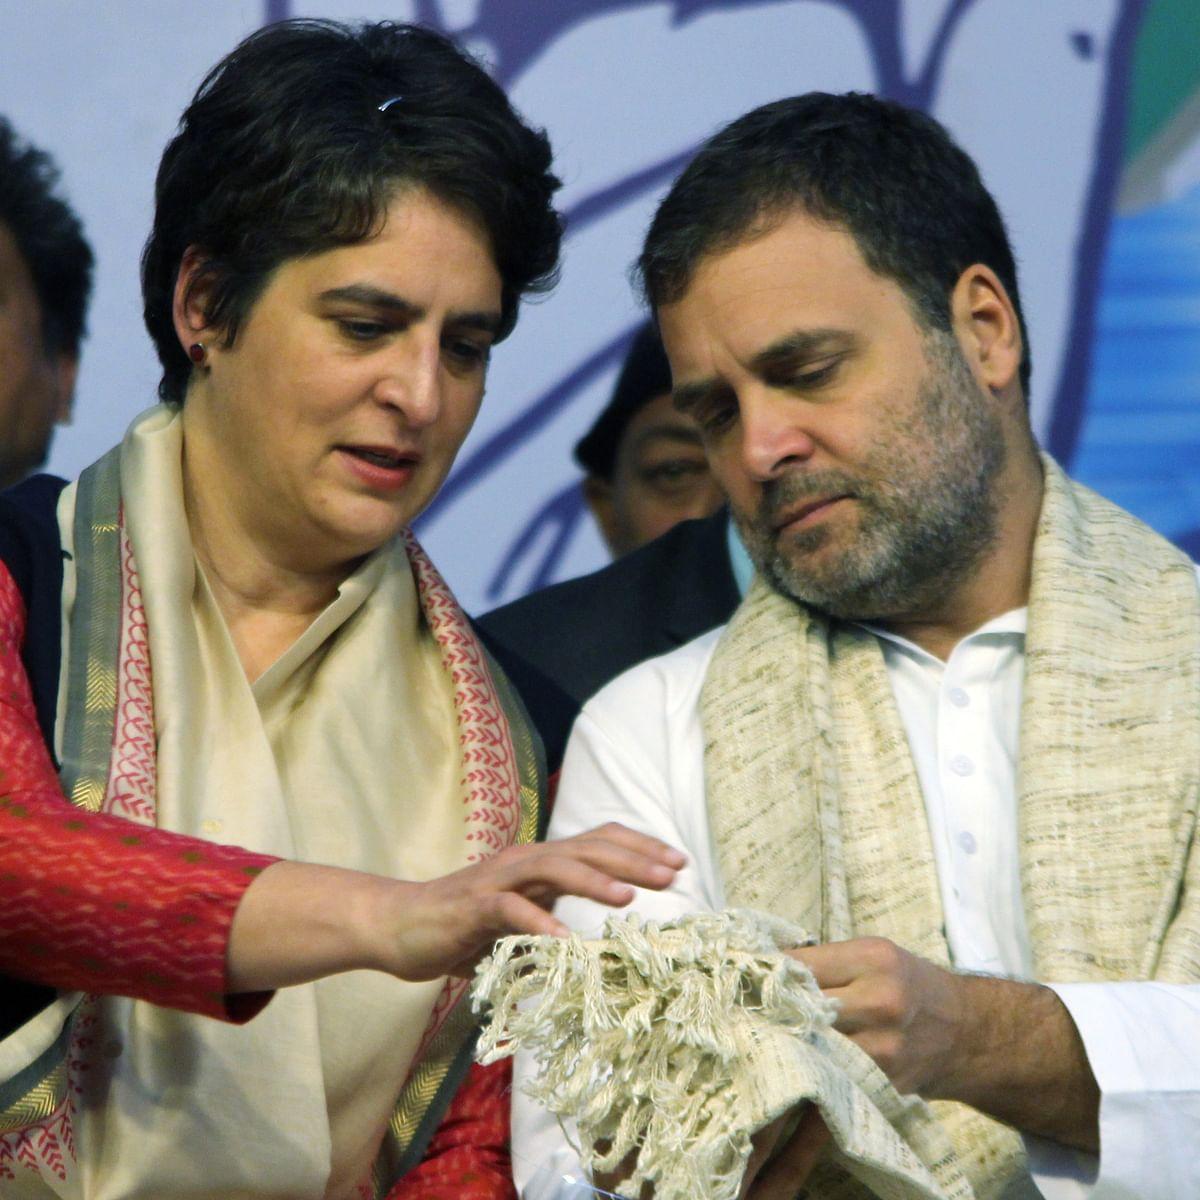 'BJP is weakening the constitution': Rahul, Priyanka Gandhi criticise Centre over  SC verdict on reservation